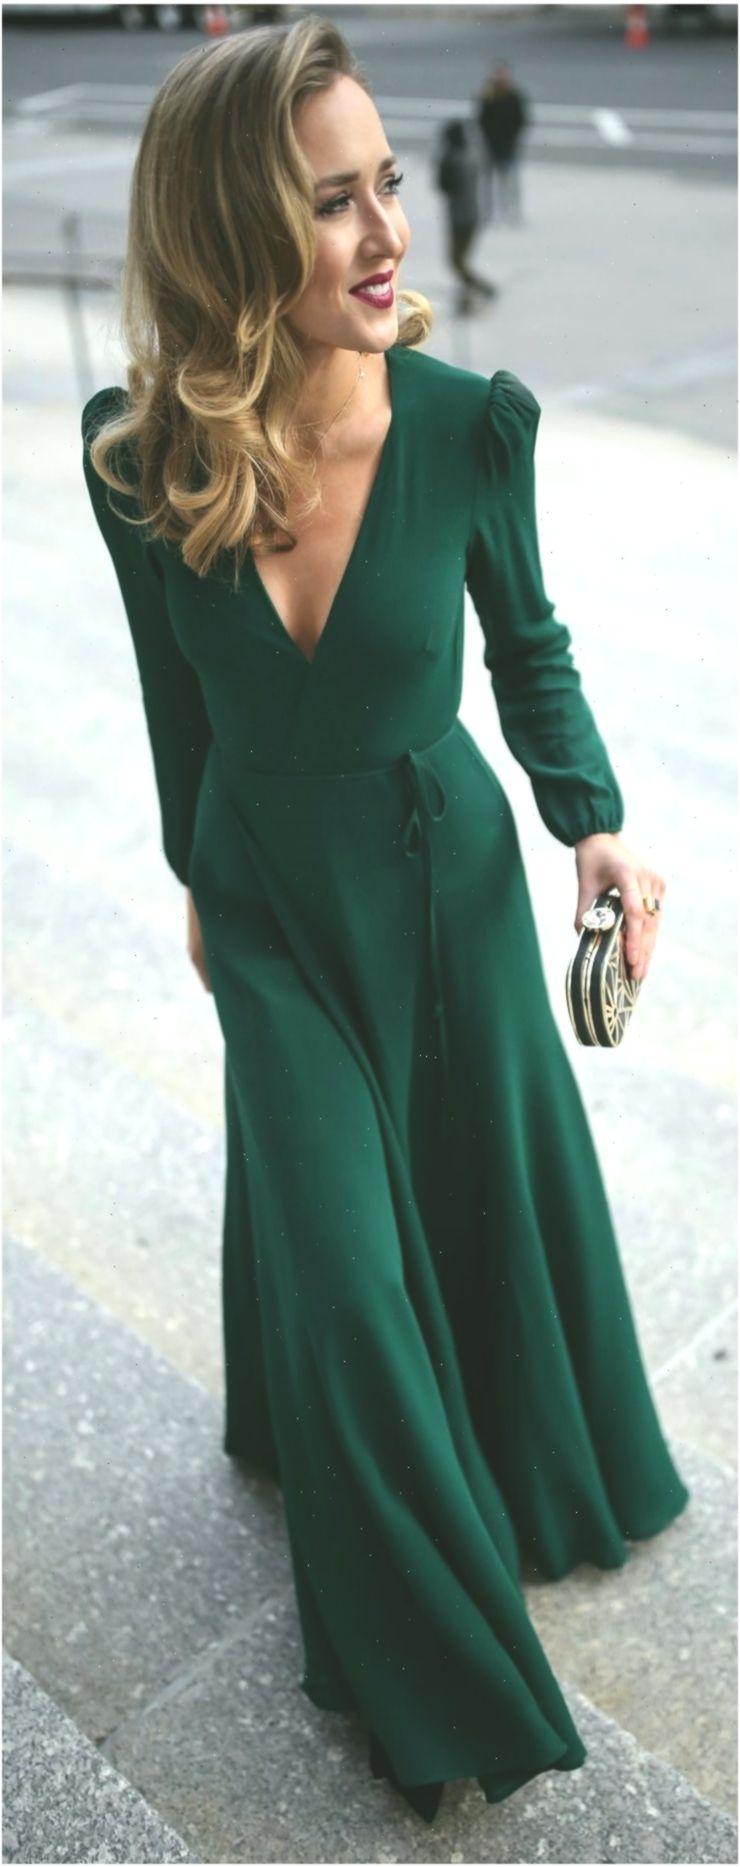 Emerald Green Long Sleeve Floor Length Wrap Dress Black And Gold Geometric Patt Fashiondressesformal Fash Long Green Dress Wrap Dress Emerald Green Dresses [ 1867 x 740 Pixel ]